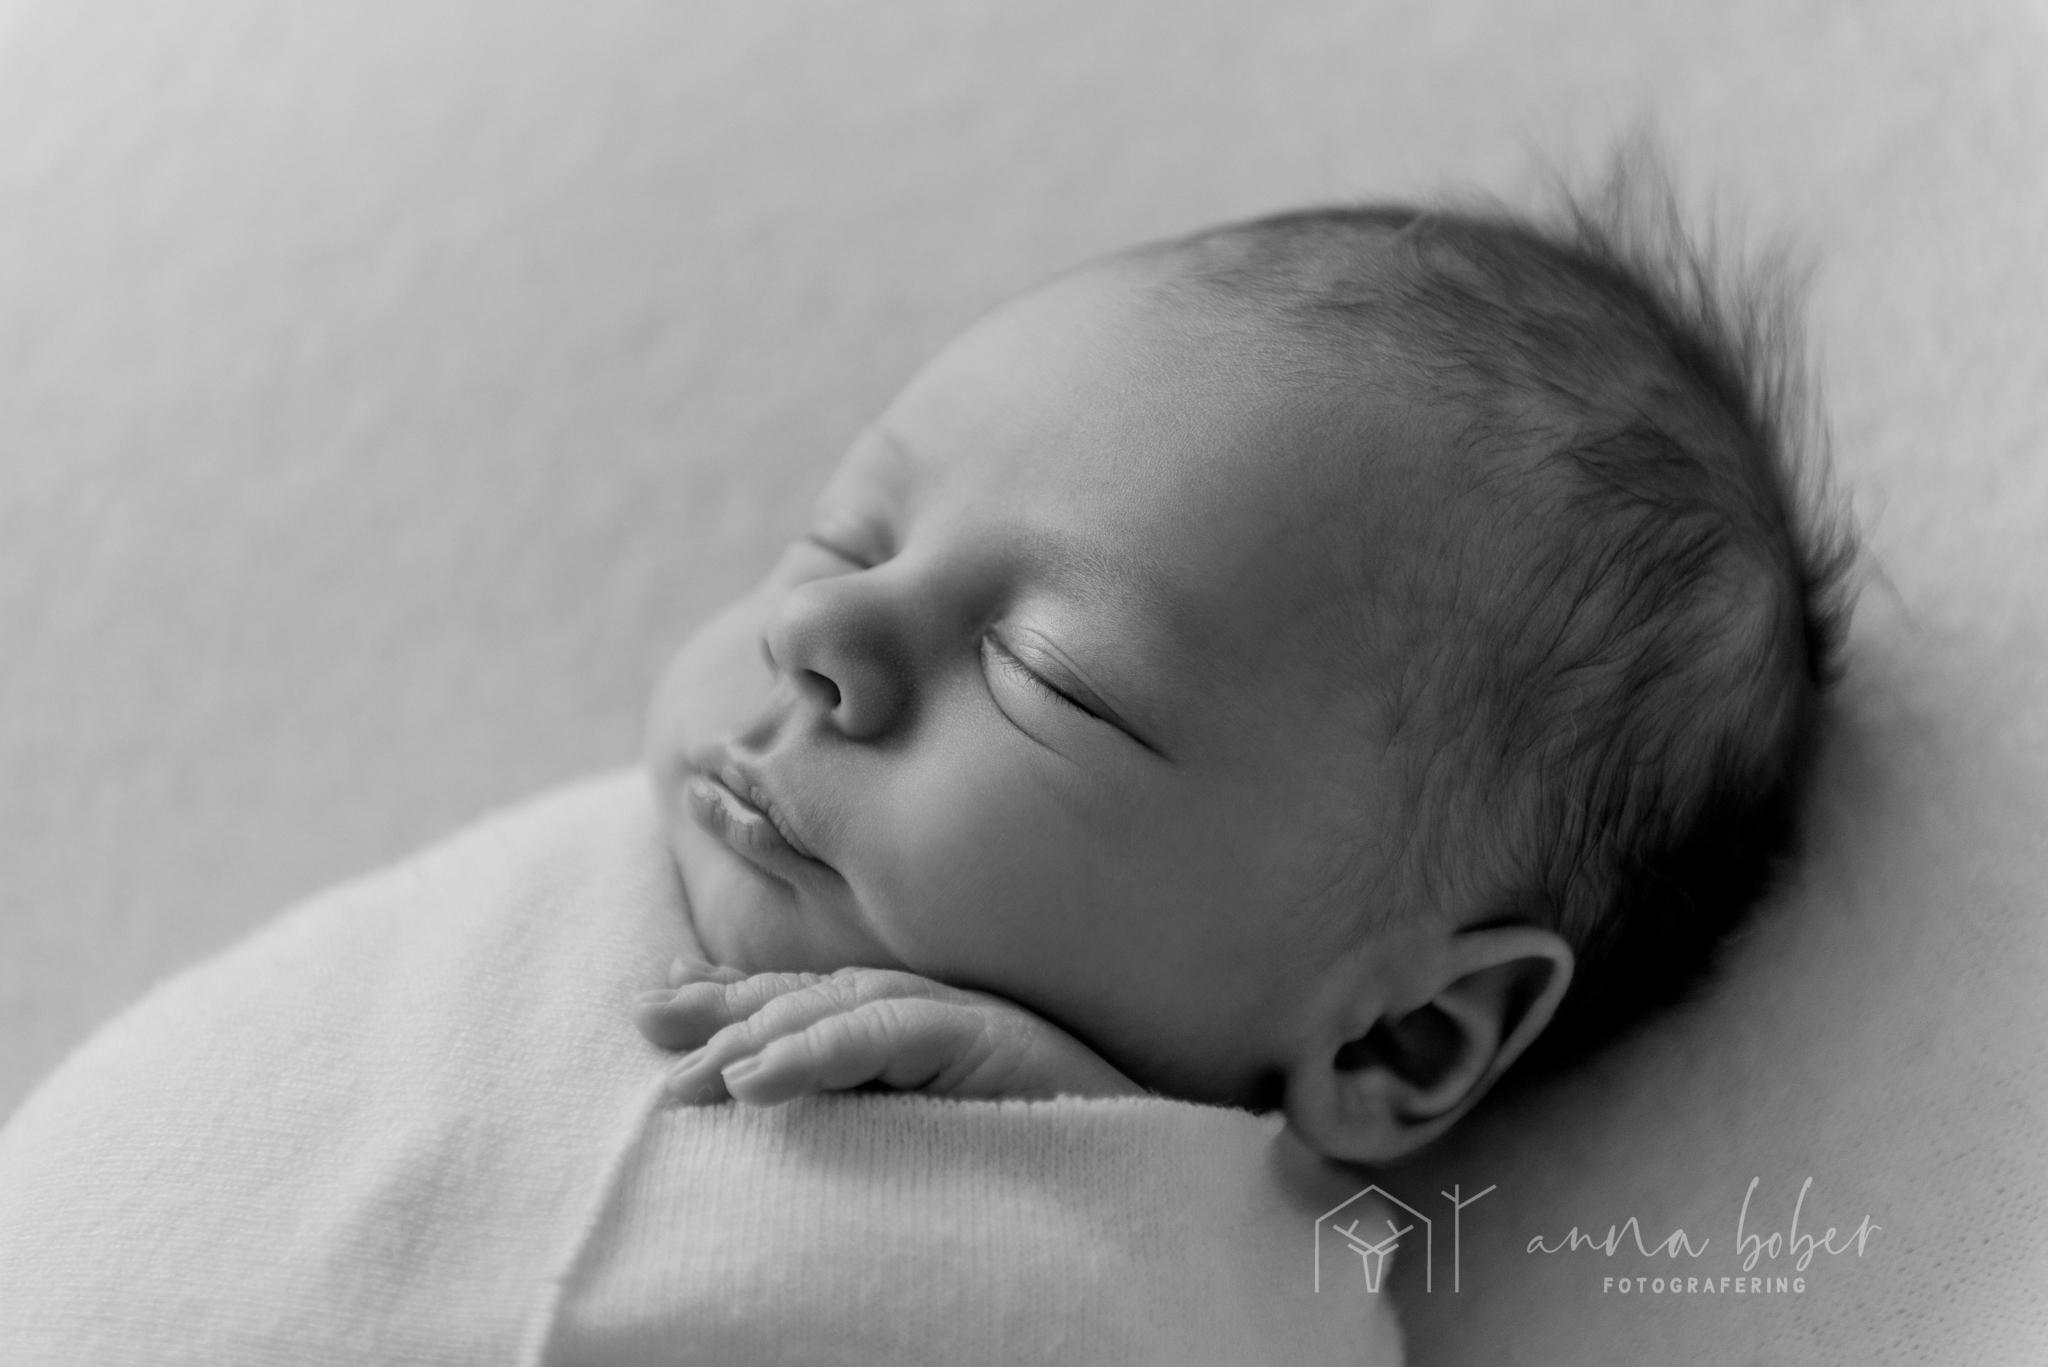 nyfødtfotografering Oslo, nyfødtfotografering Jessheim, nyfødtfotograf, barnefotografering Oslo, fotostudio Oslo, familiefotograf Oslo